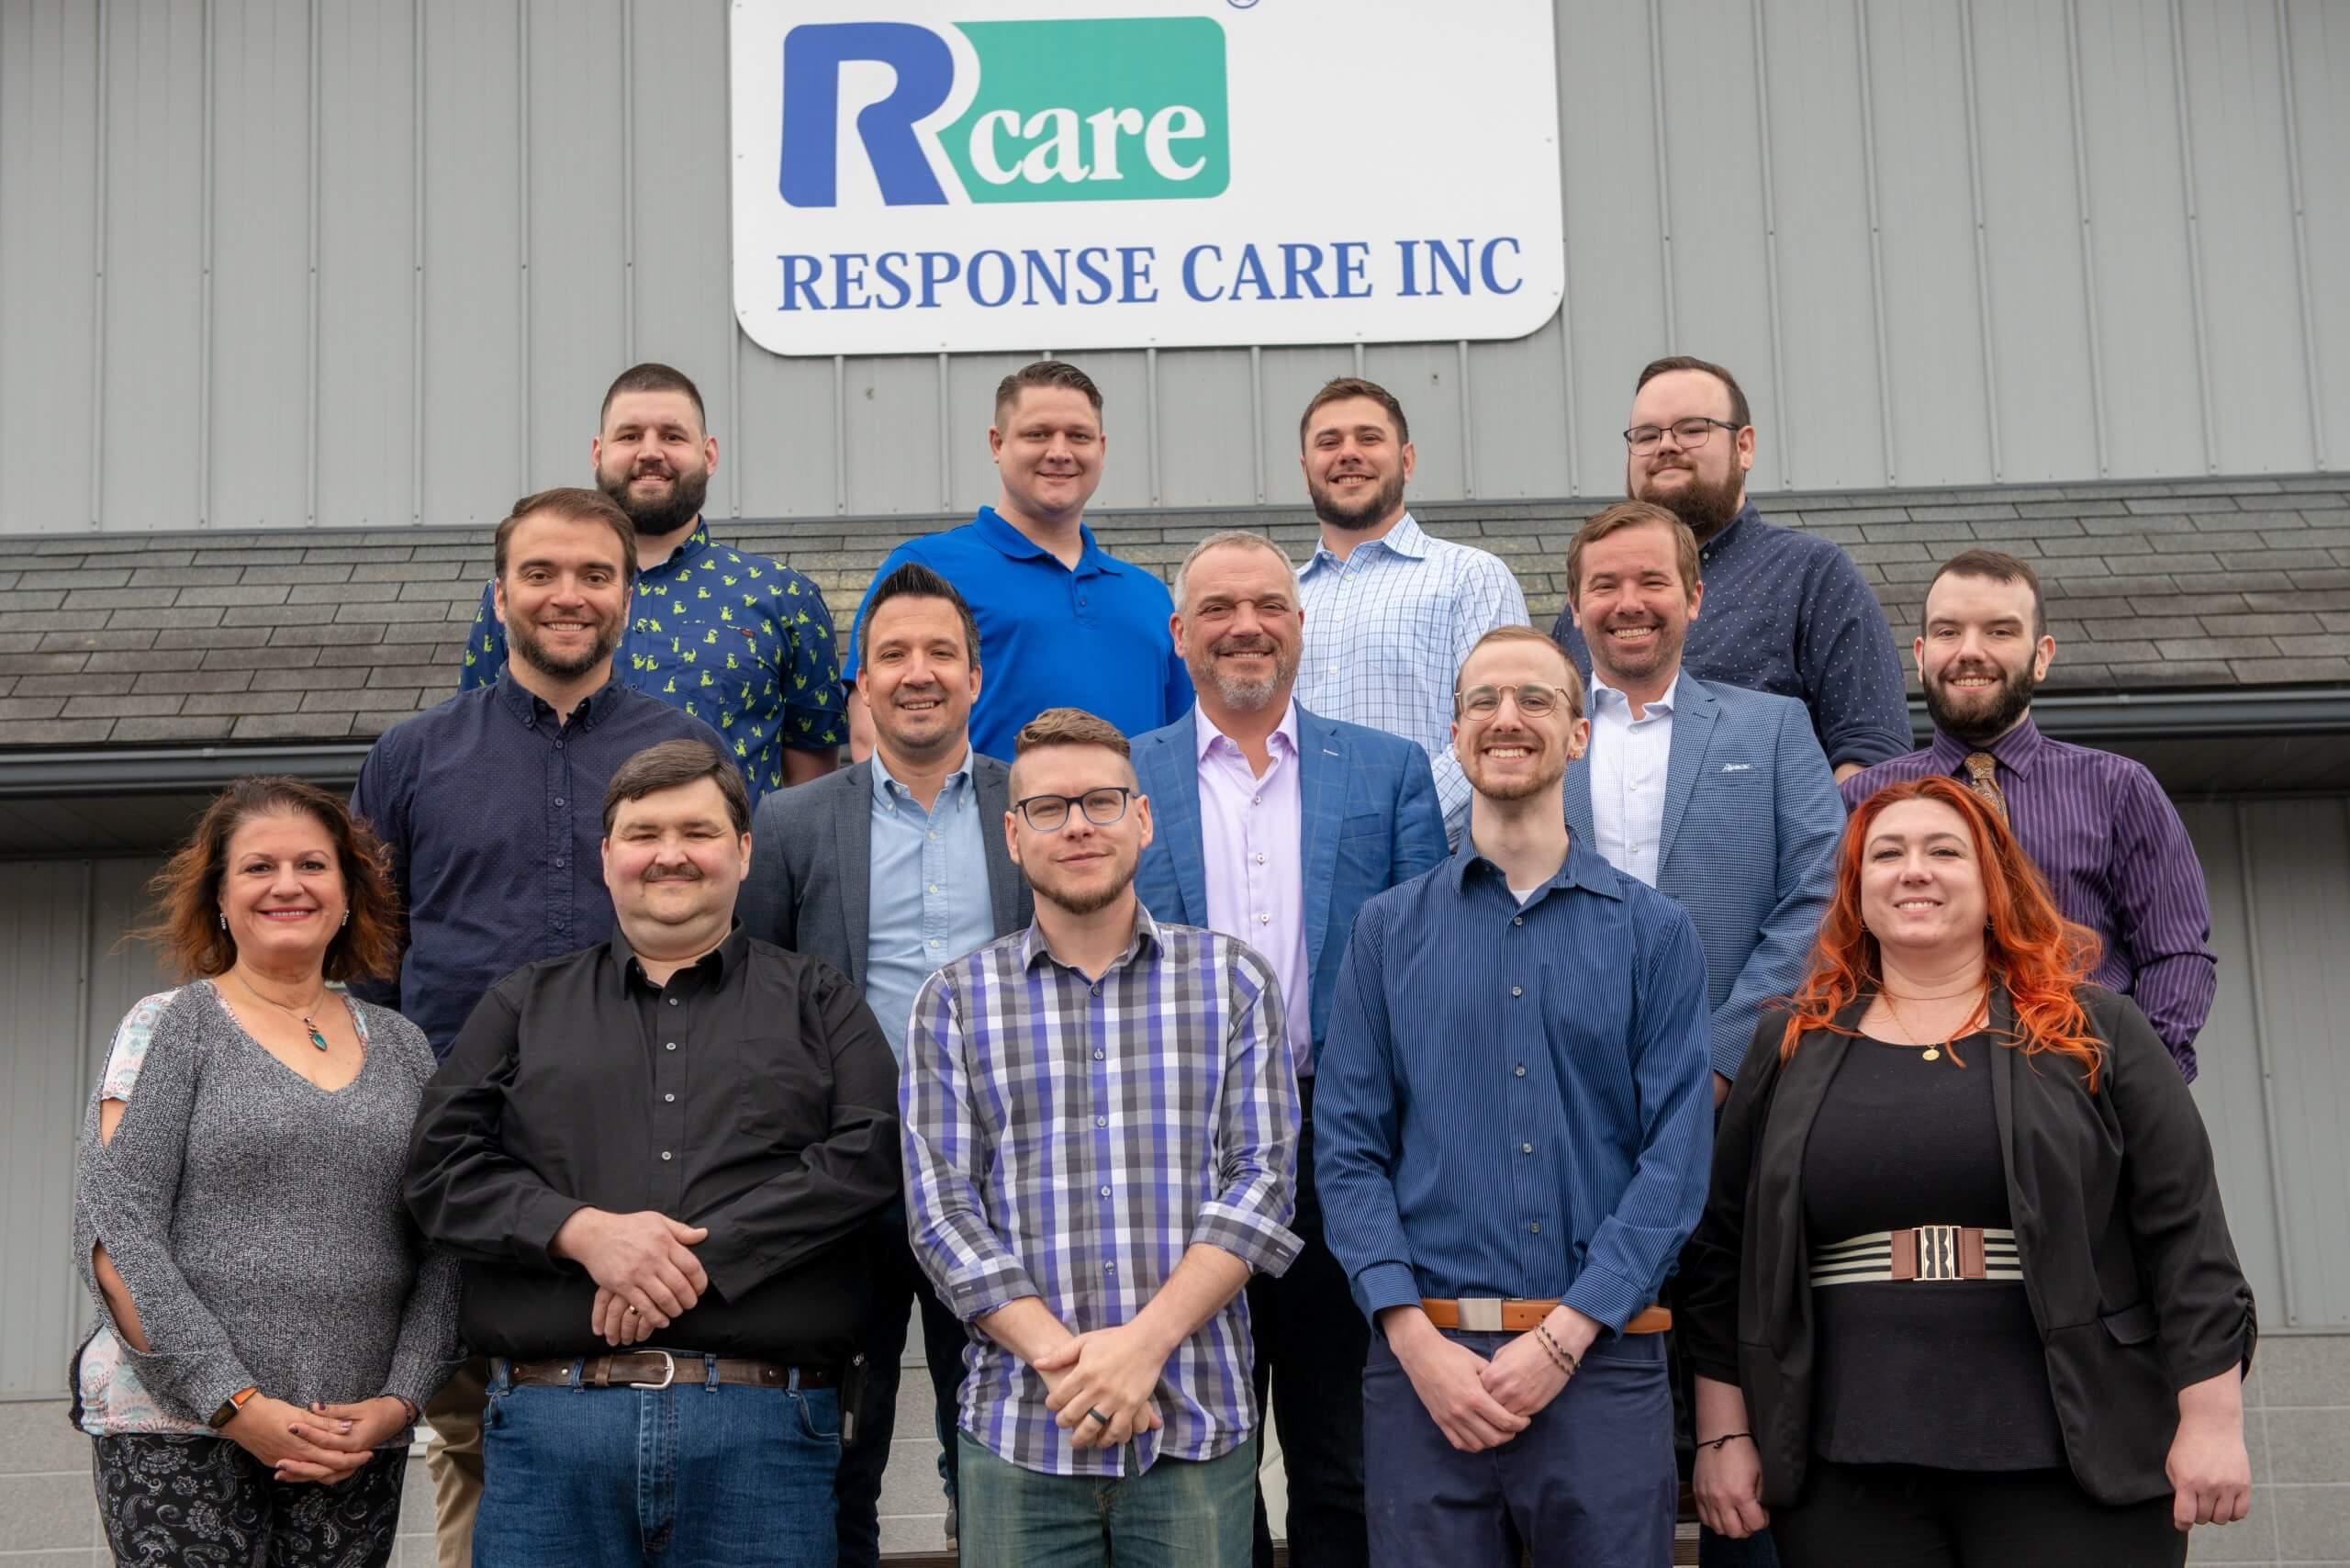 RCare Team